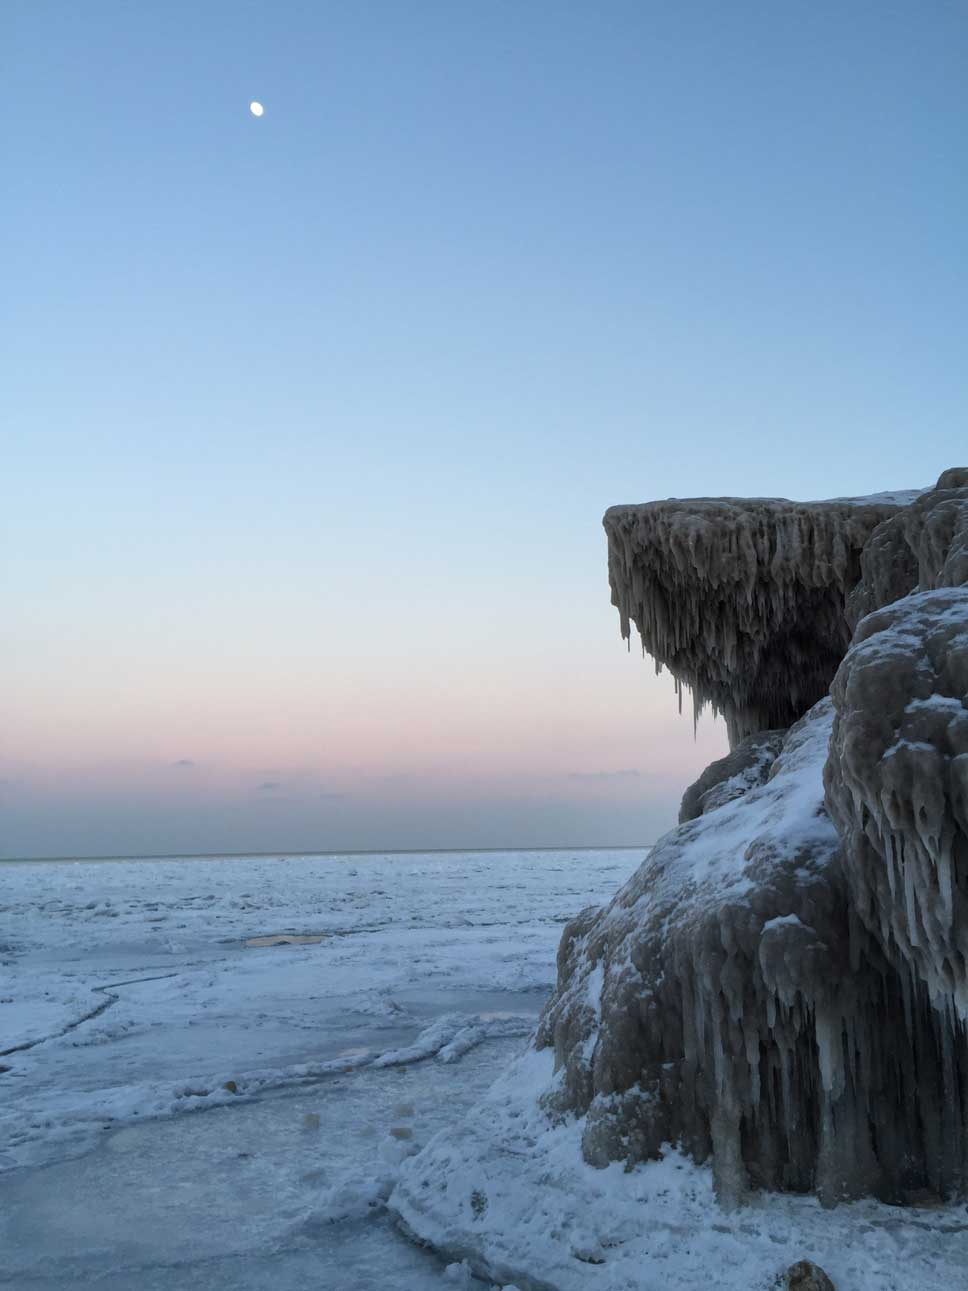 Photos of Sunrise Beach in Lake Bluff, March 1, 2015, by Adrienne Fawcett